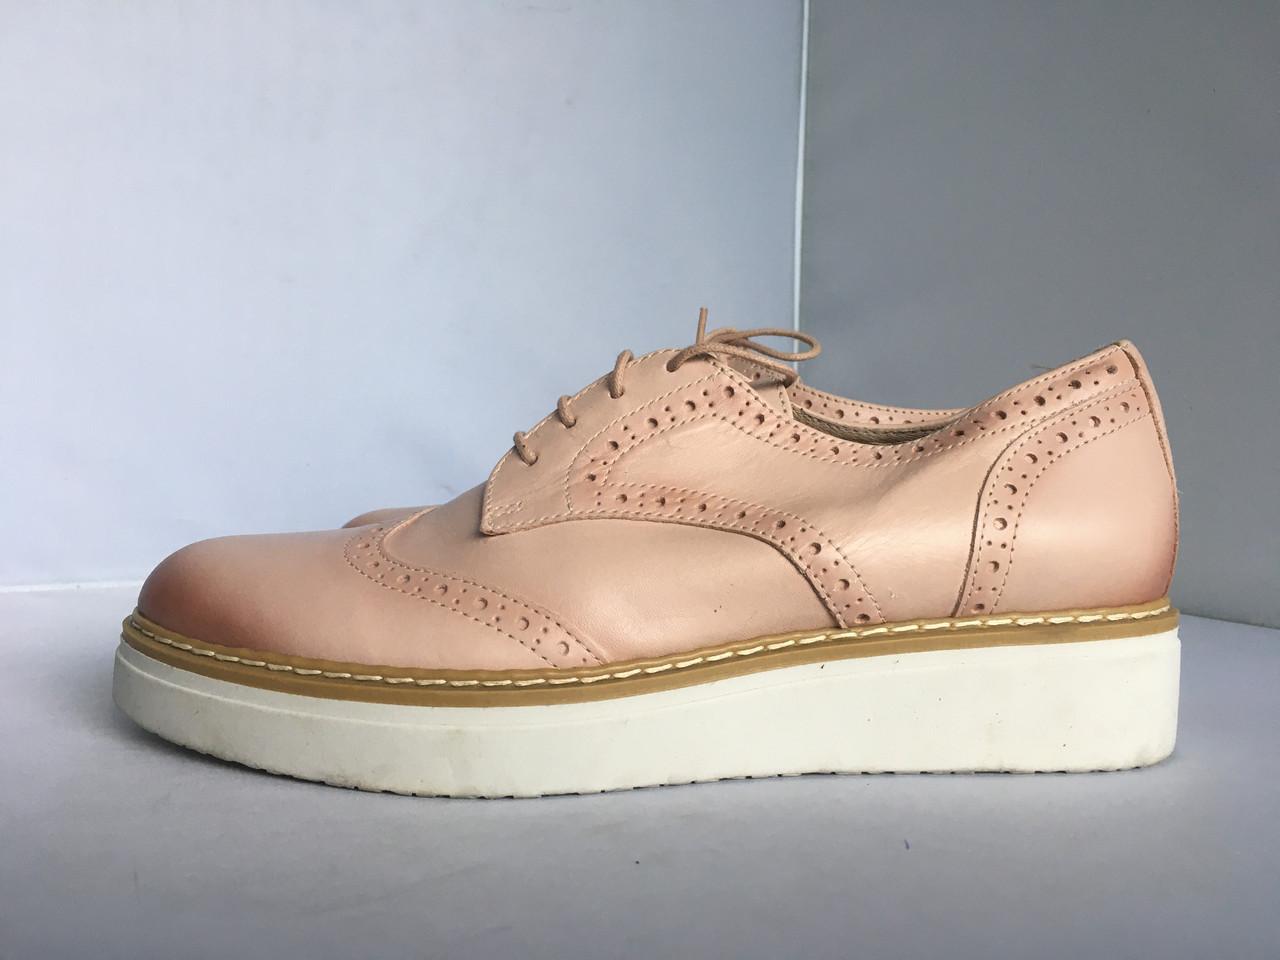 Женские туфли- броги San Marina, 36, 37 размер